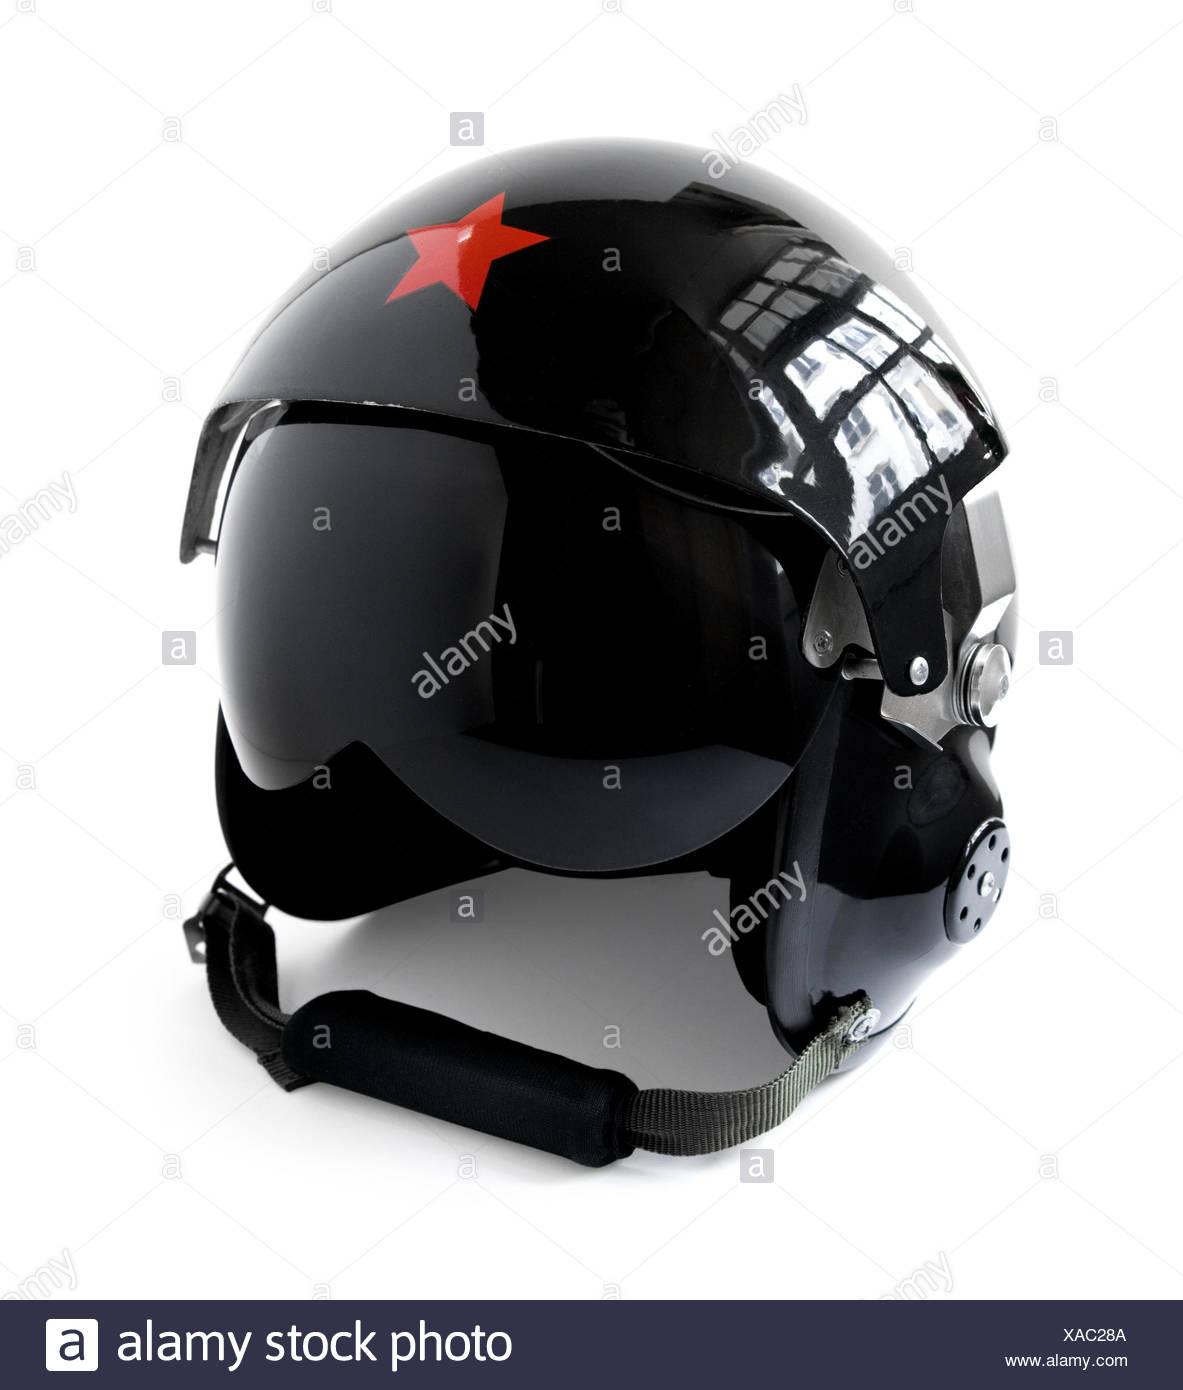 Pilot Helmet Plane Stock Photos & Pilot Helmet Plane Stock ...